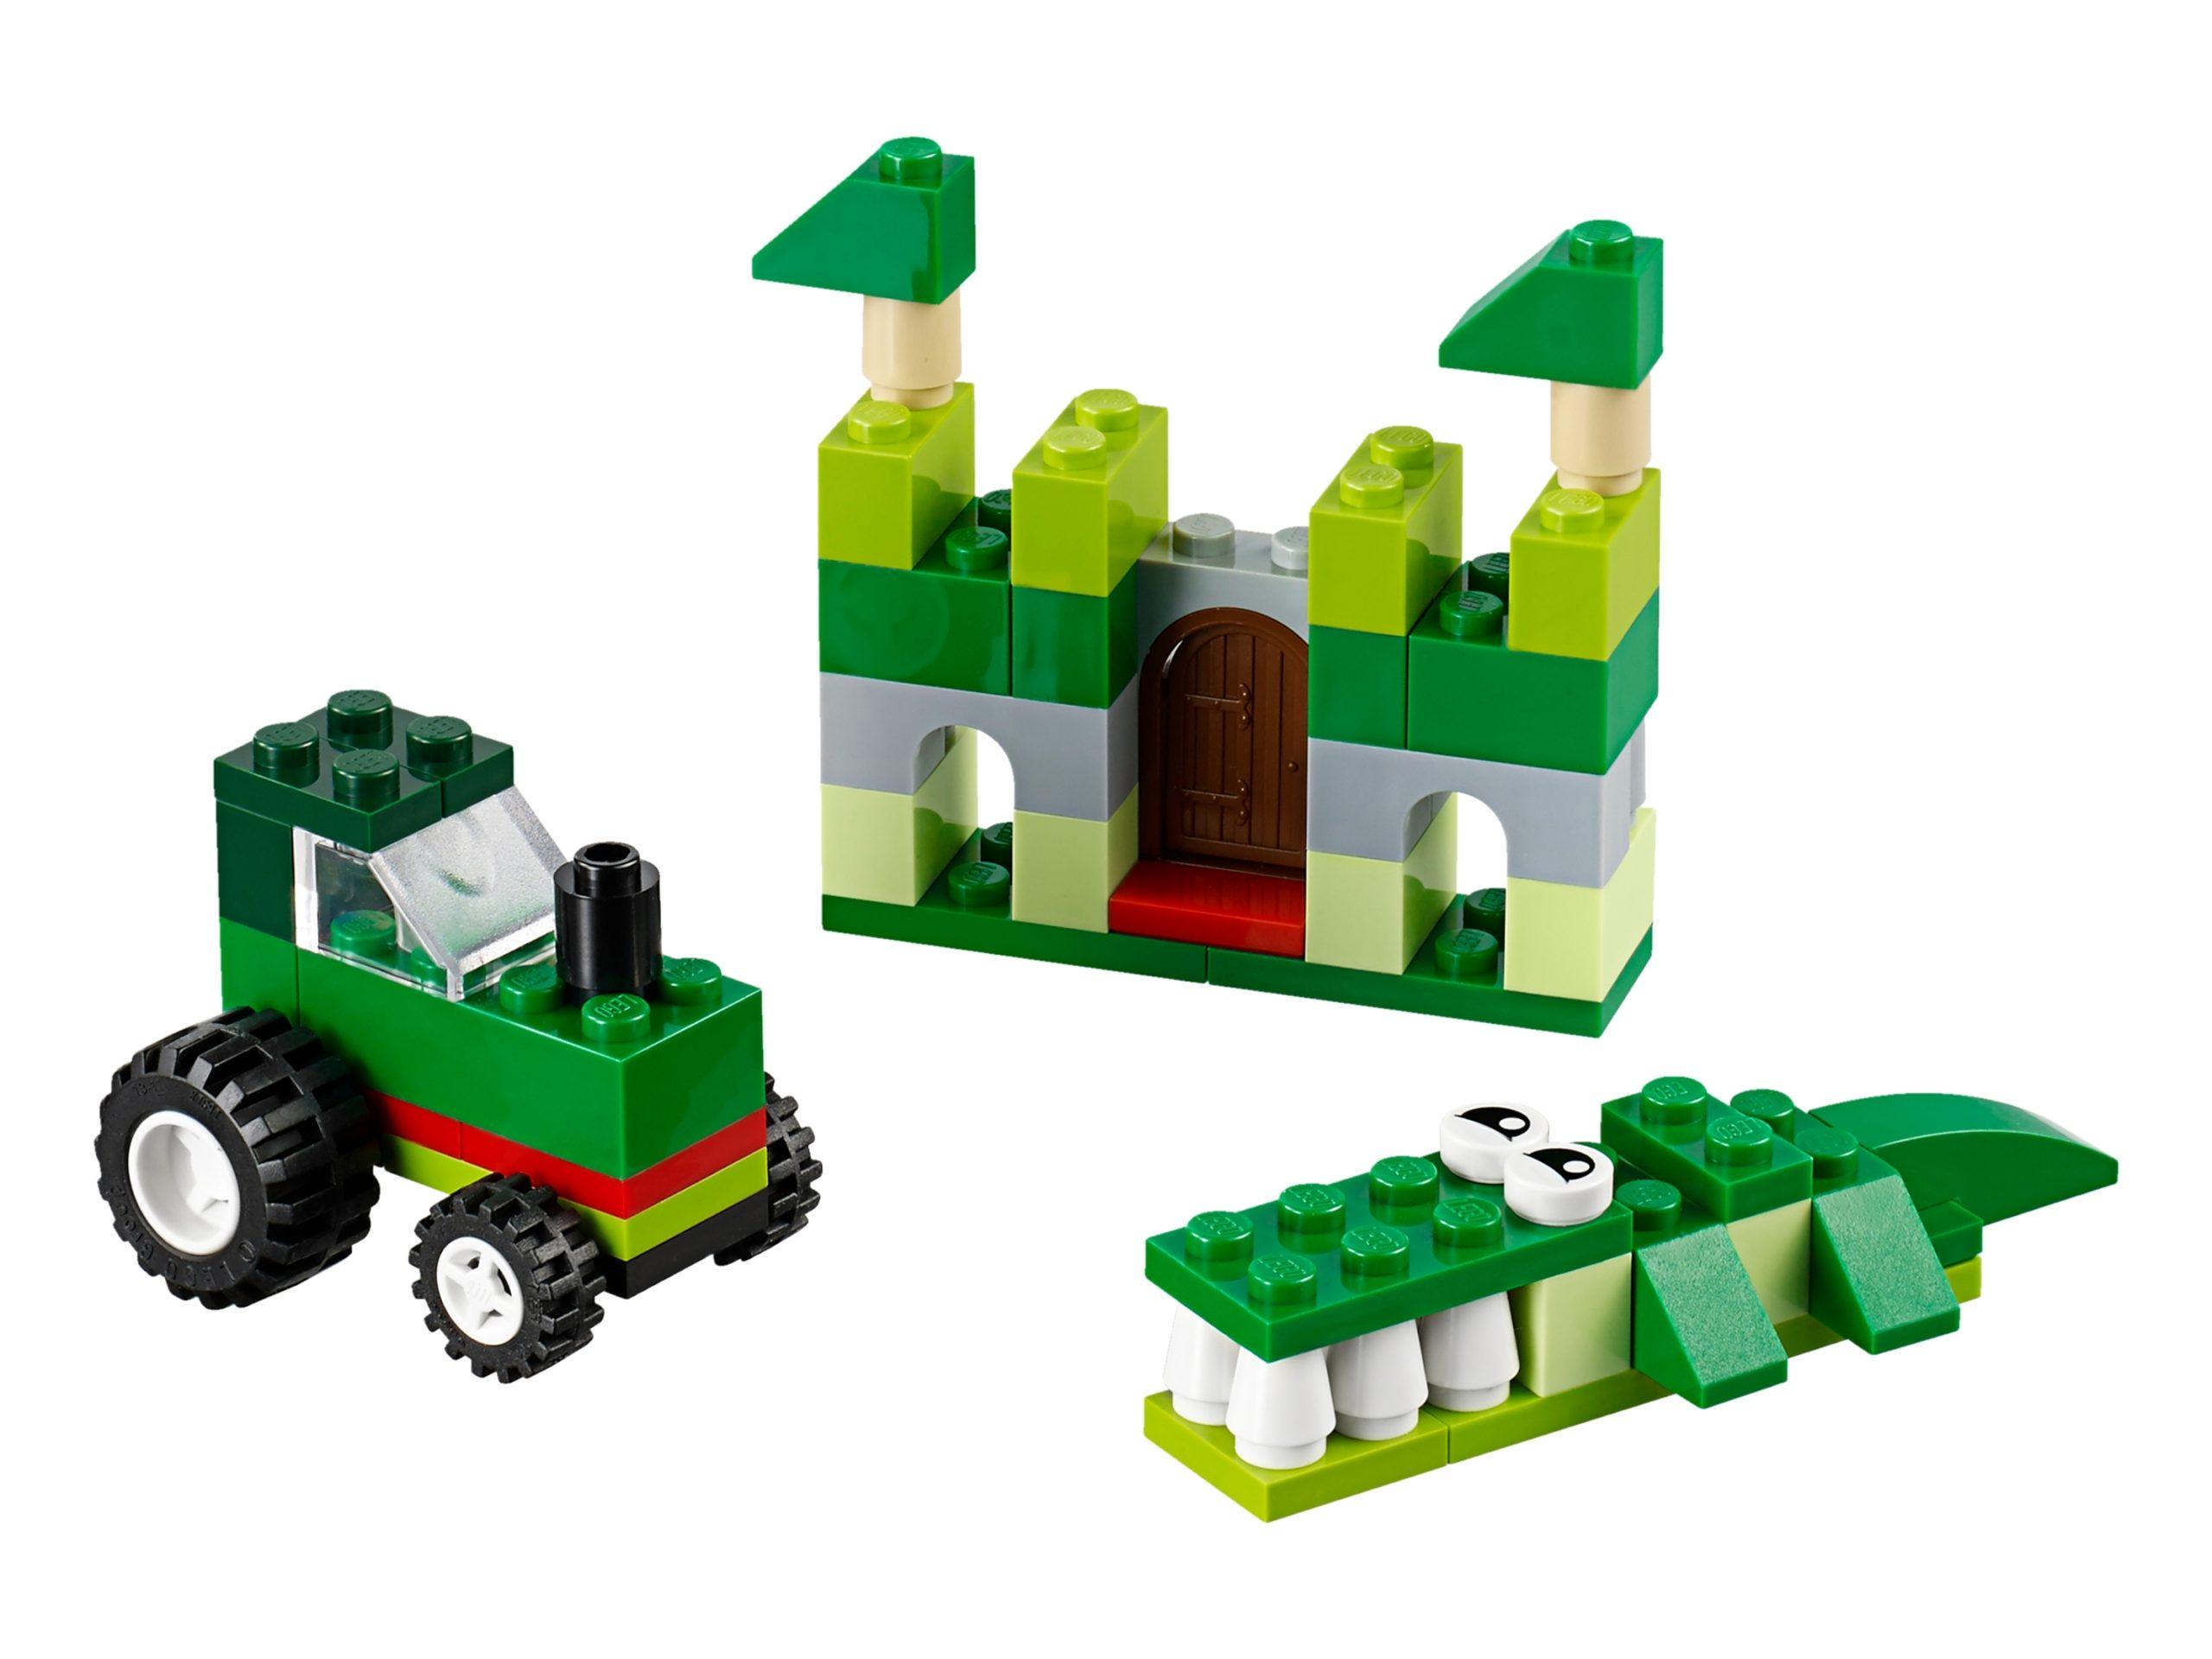 lego 10708 boite de construction verte scaled